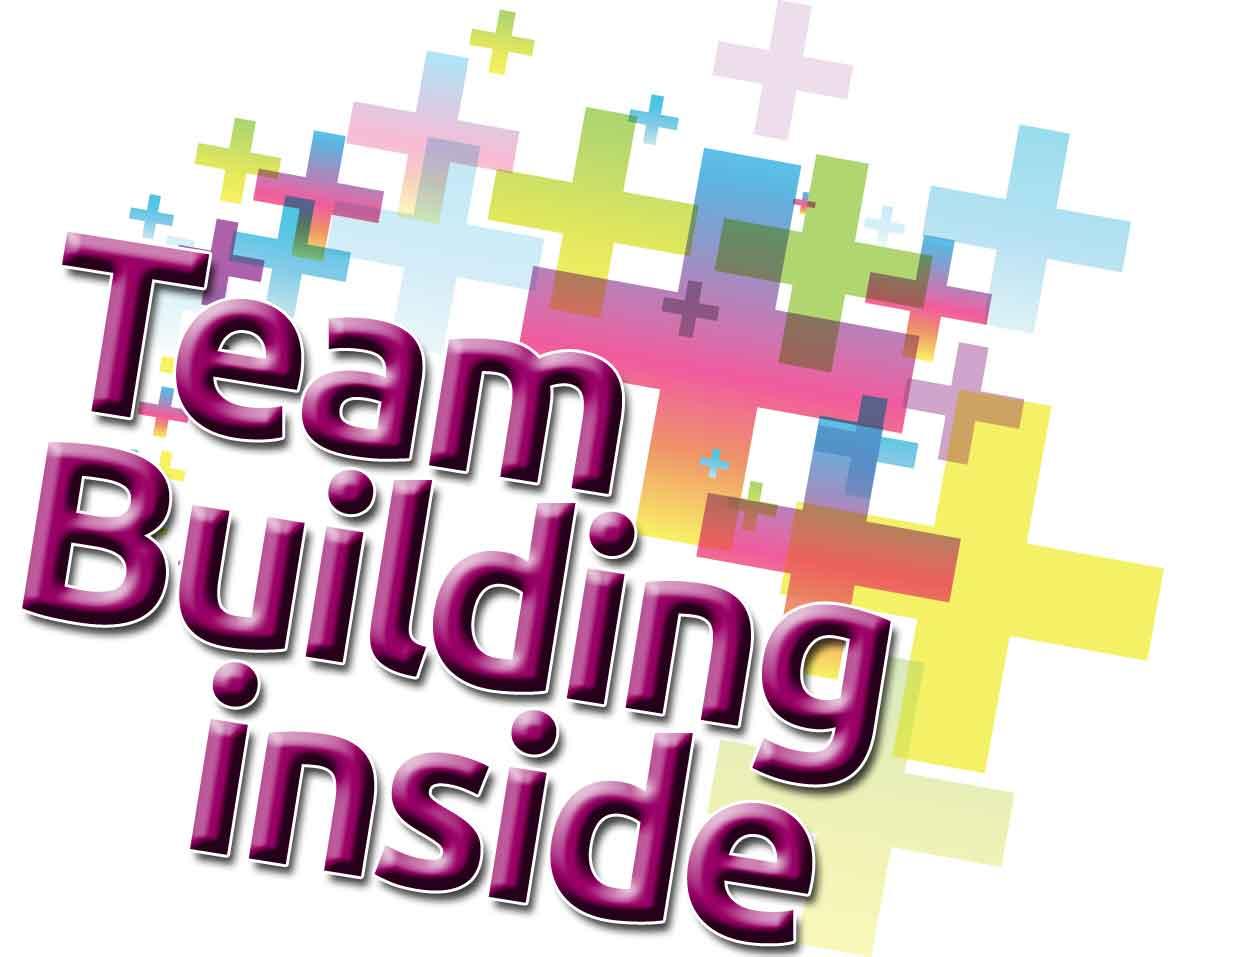 Team Building inside LOGO header - OlivierRebiere.com